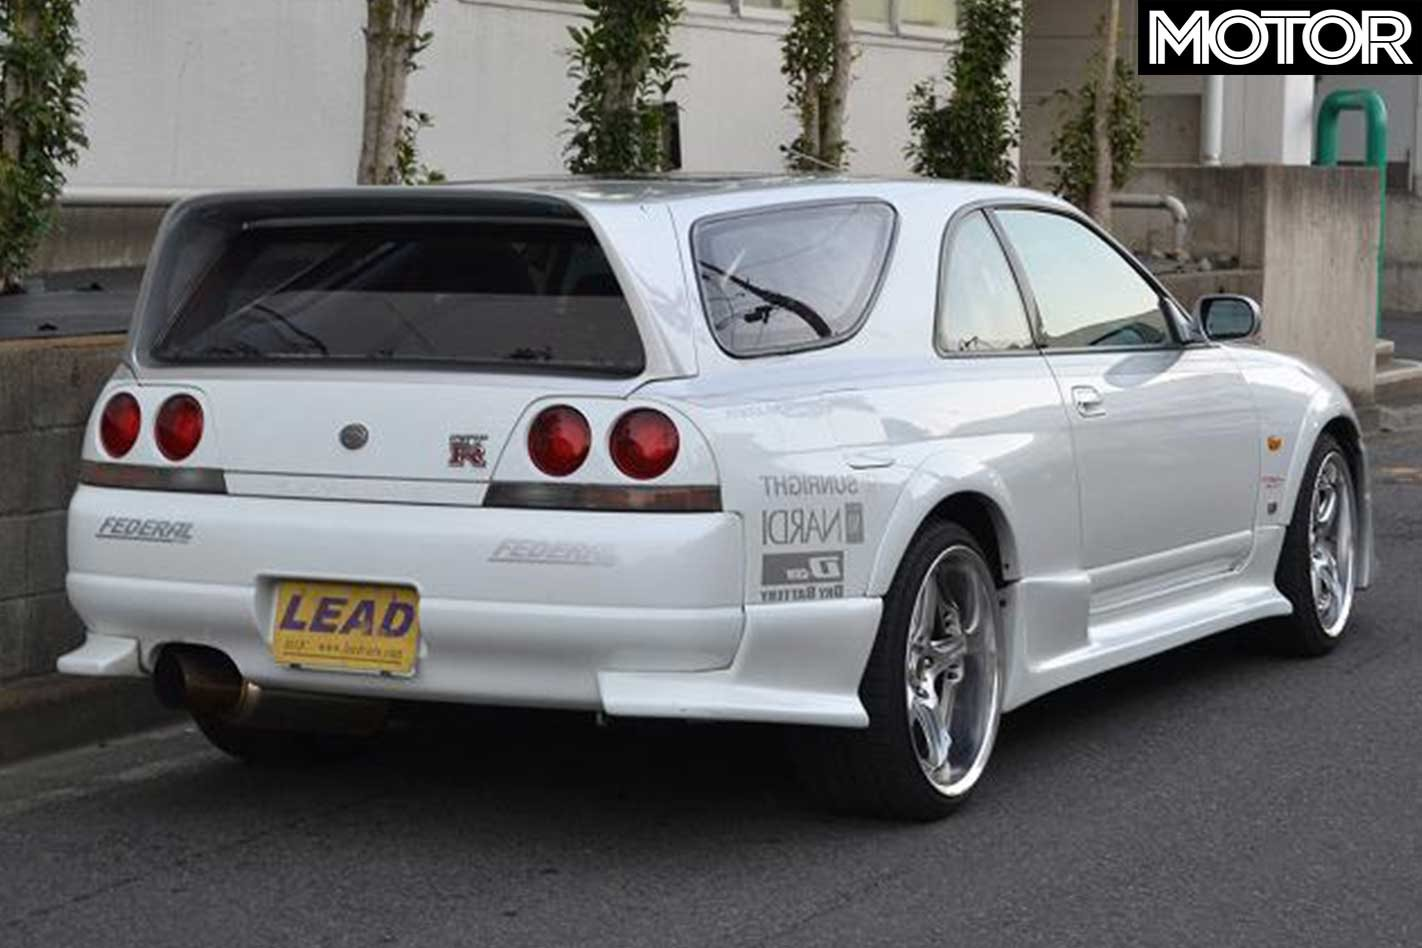 Nissan R33 Skyline GT-R 'shooting brake' for sale